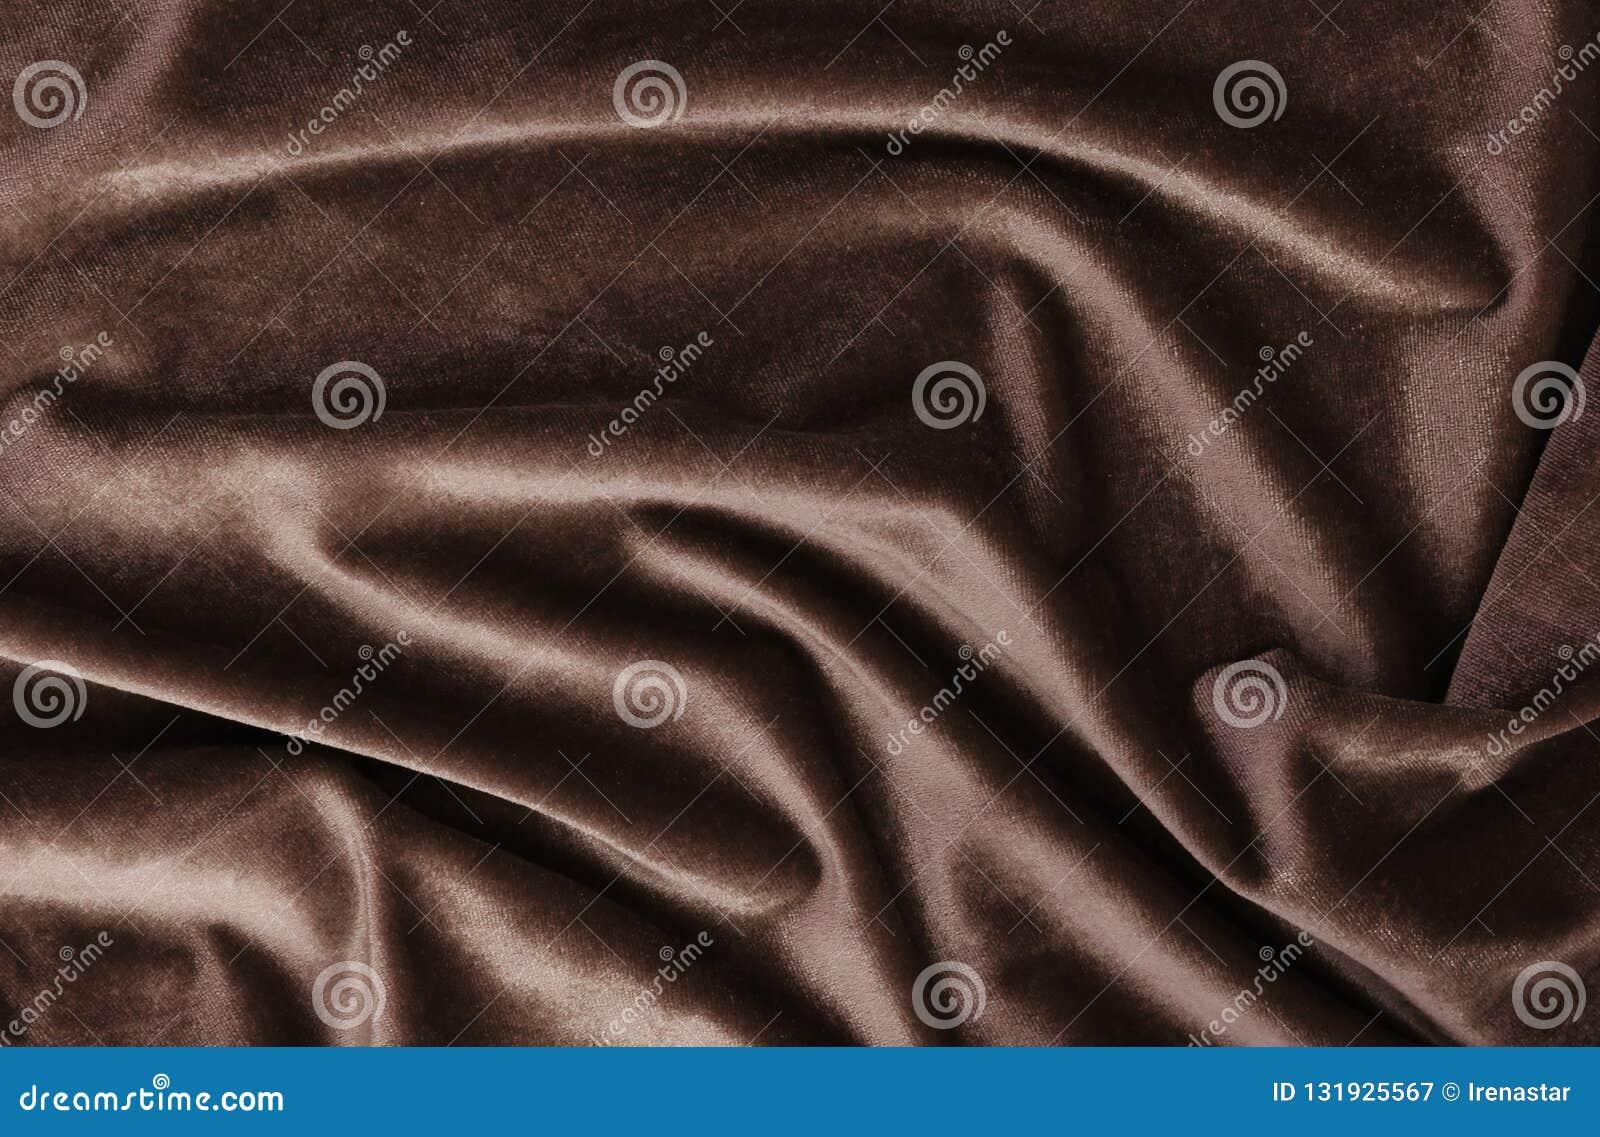 Fond de velours, texture, couleur brune, luxe cher, tissu,